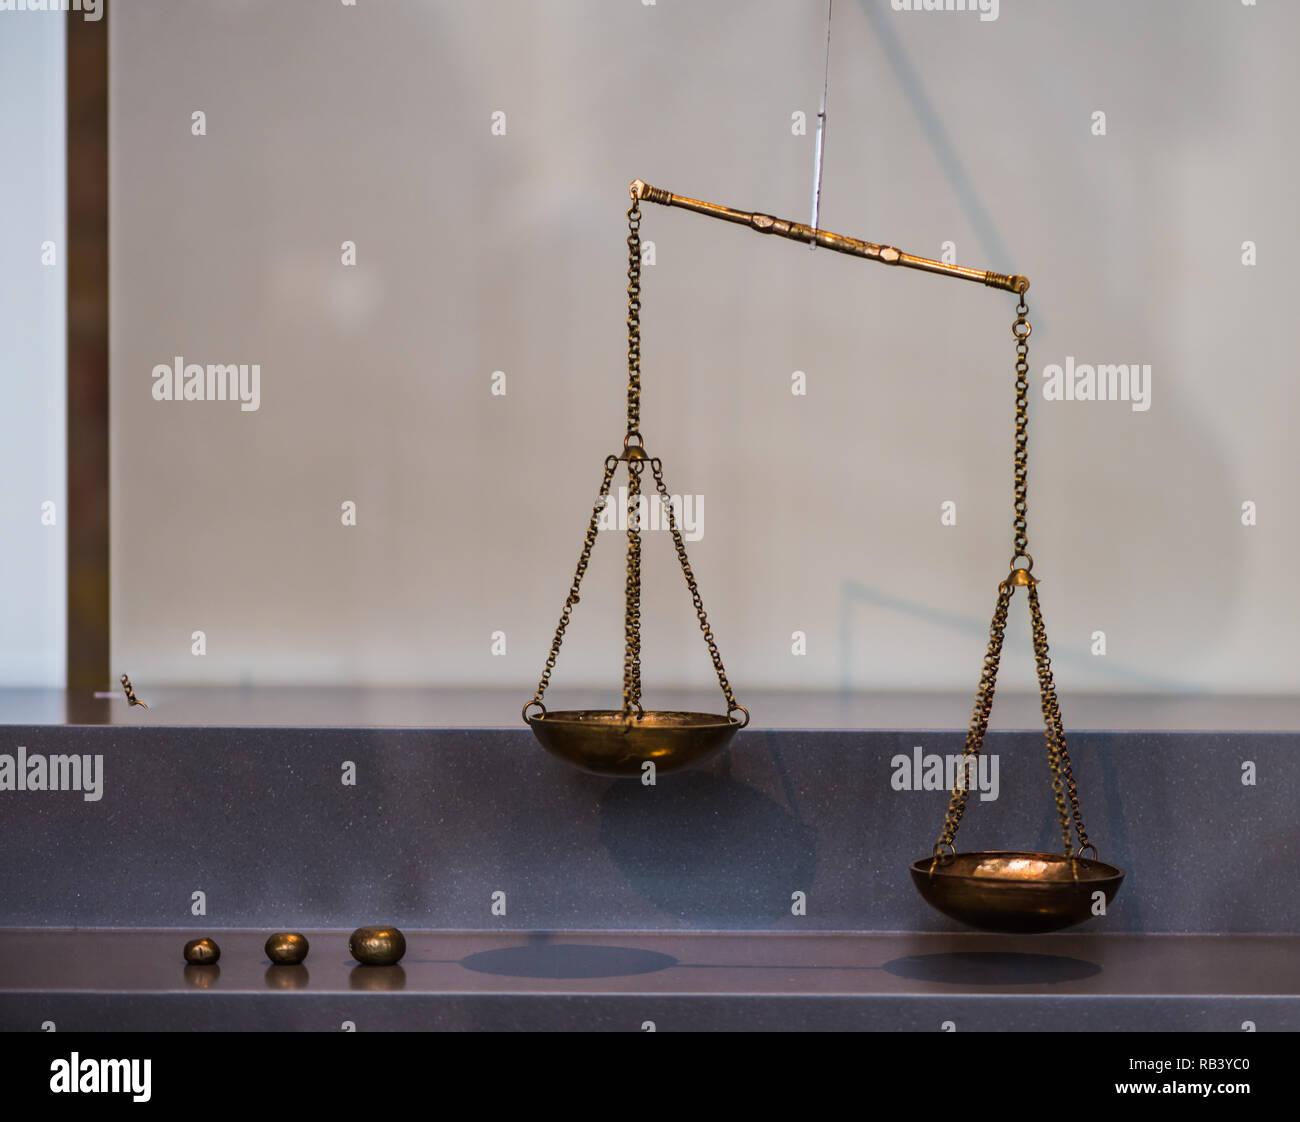 Vintage brass balance with mass - Stock Image